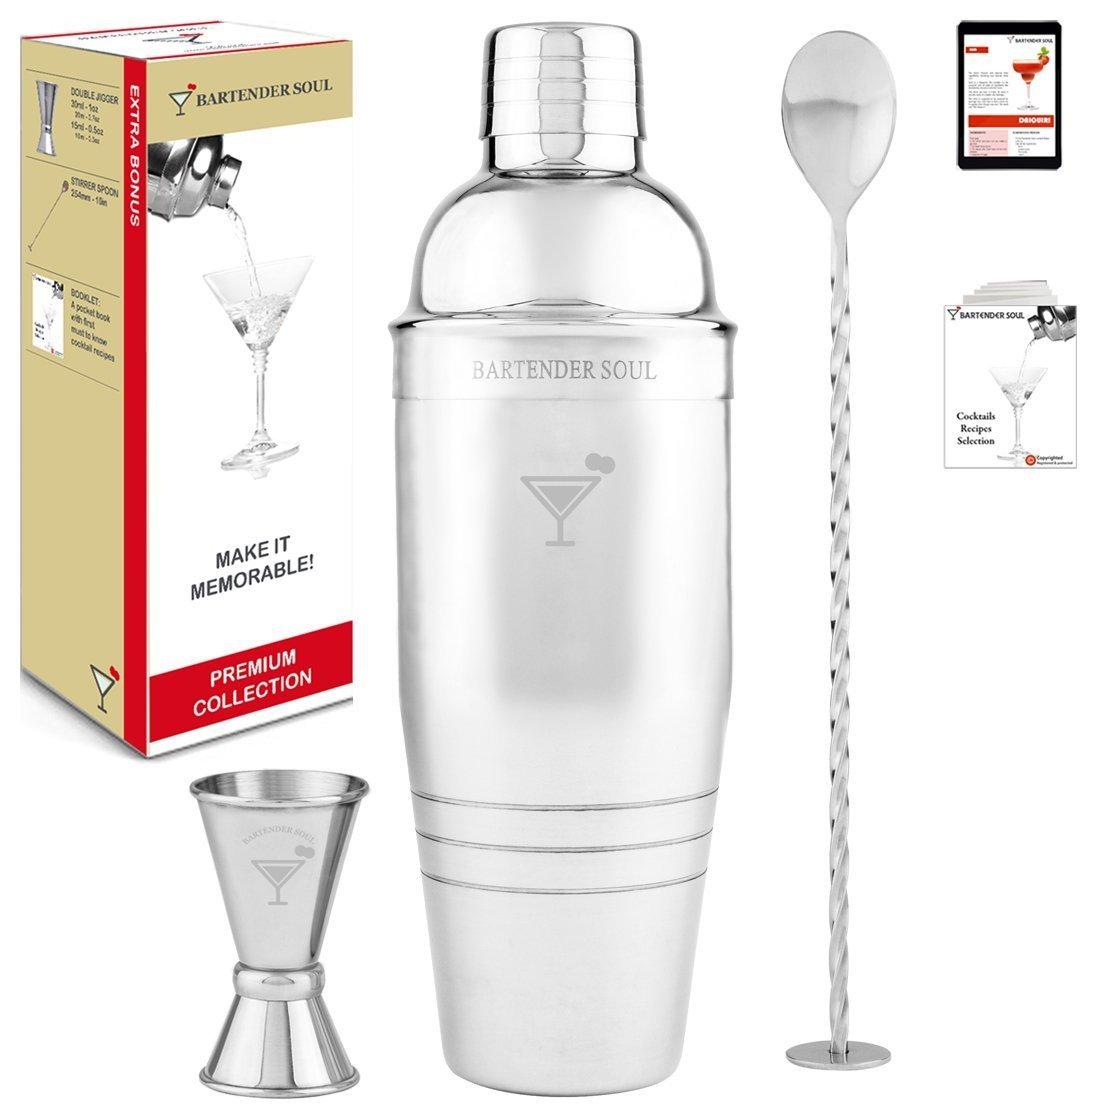 Premium Cocktailshaker Set von BARTENDER SOUL - 770ml ...